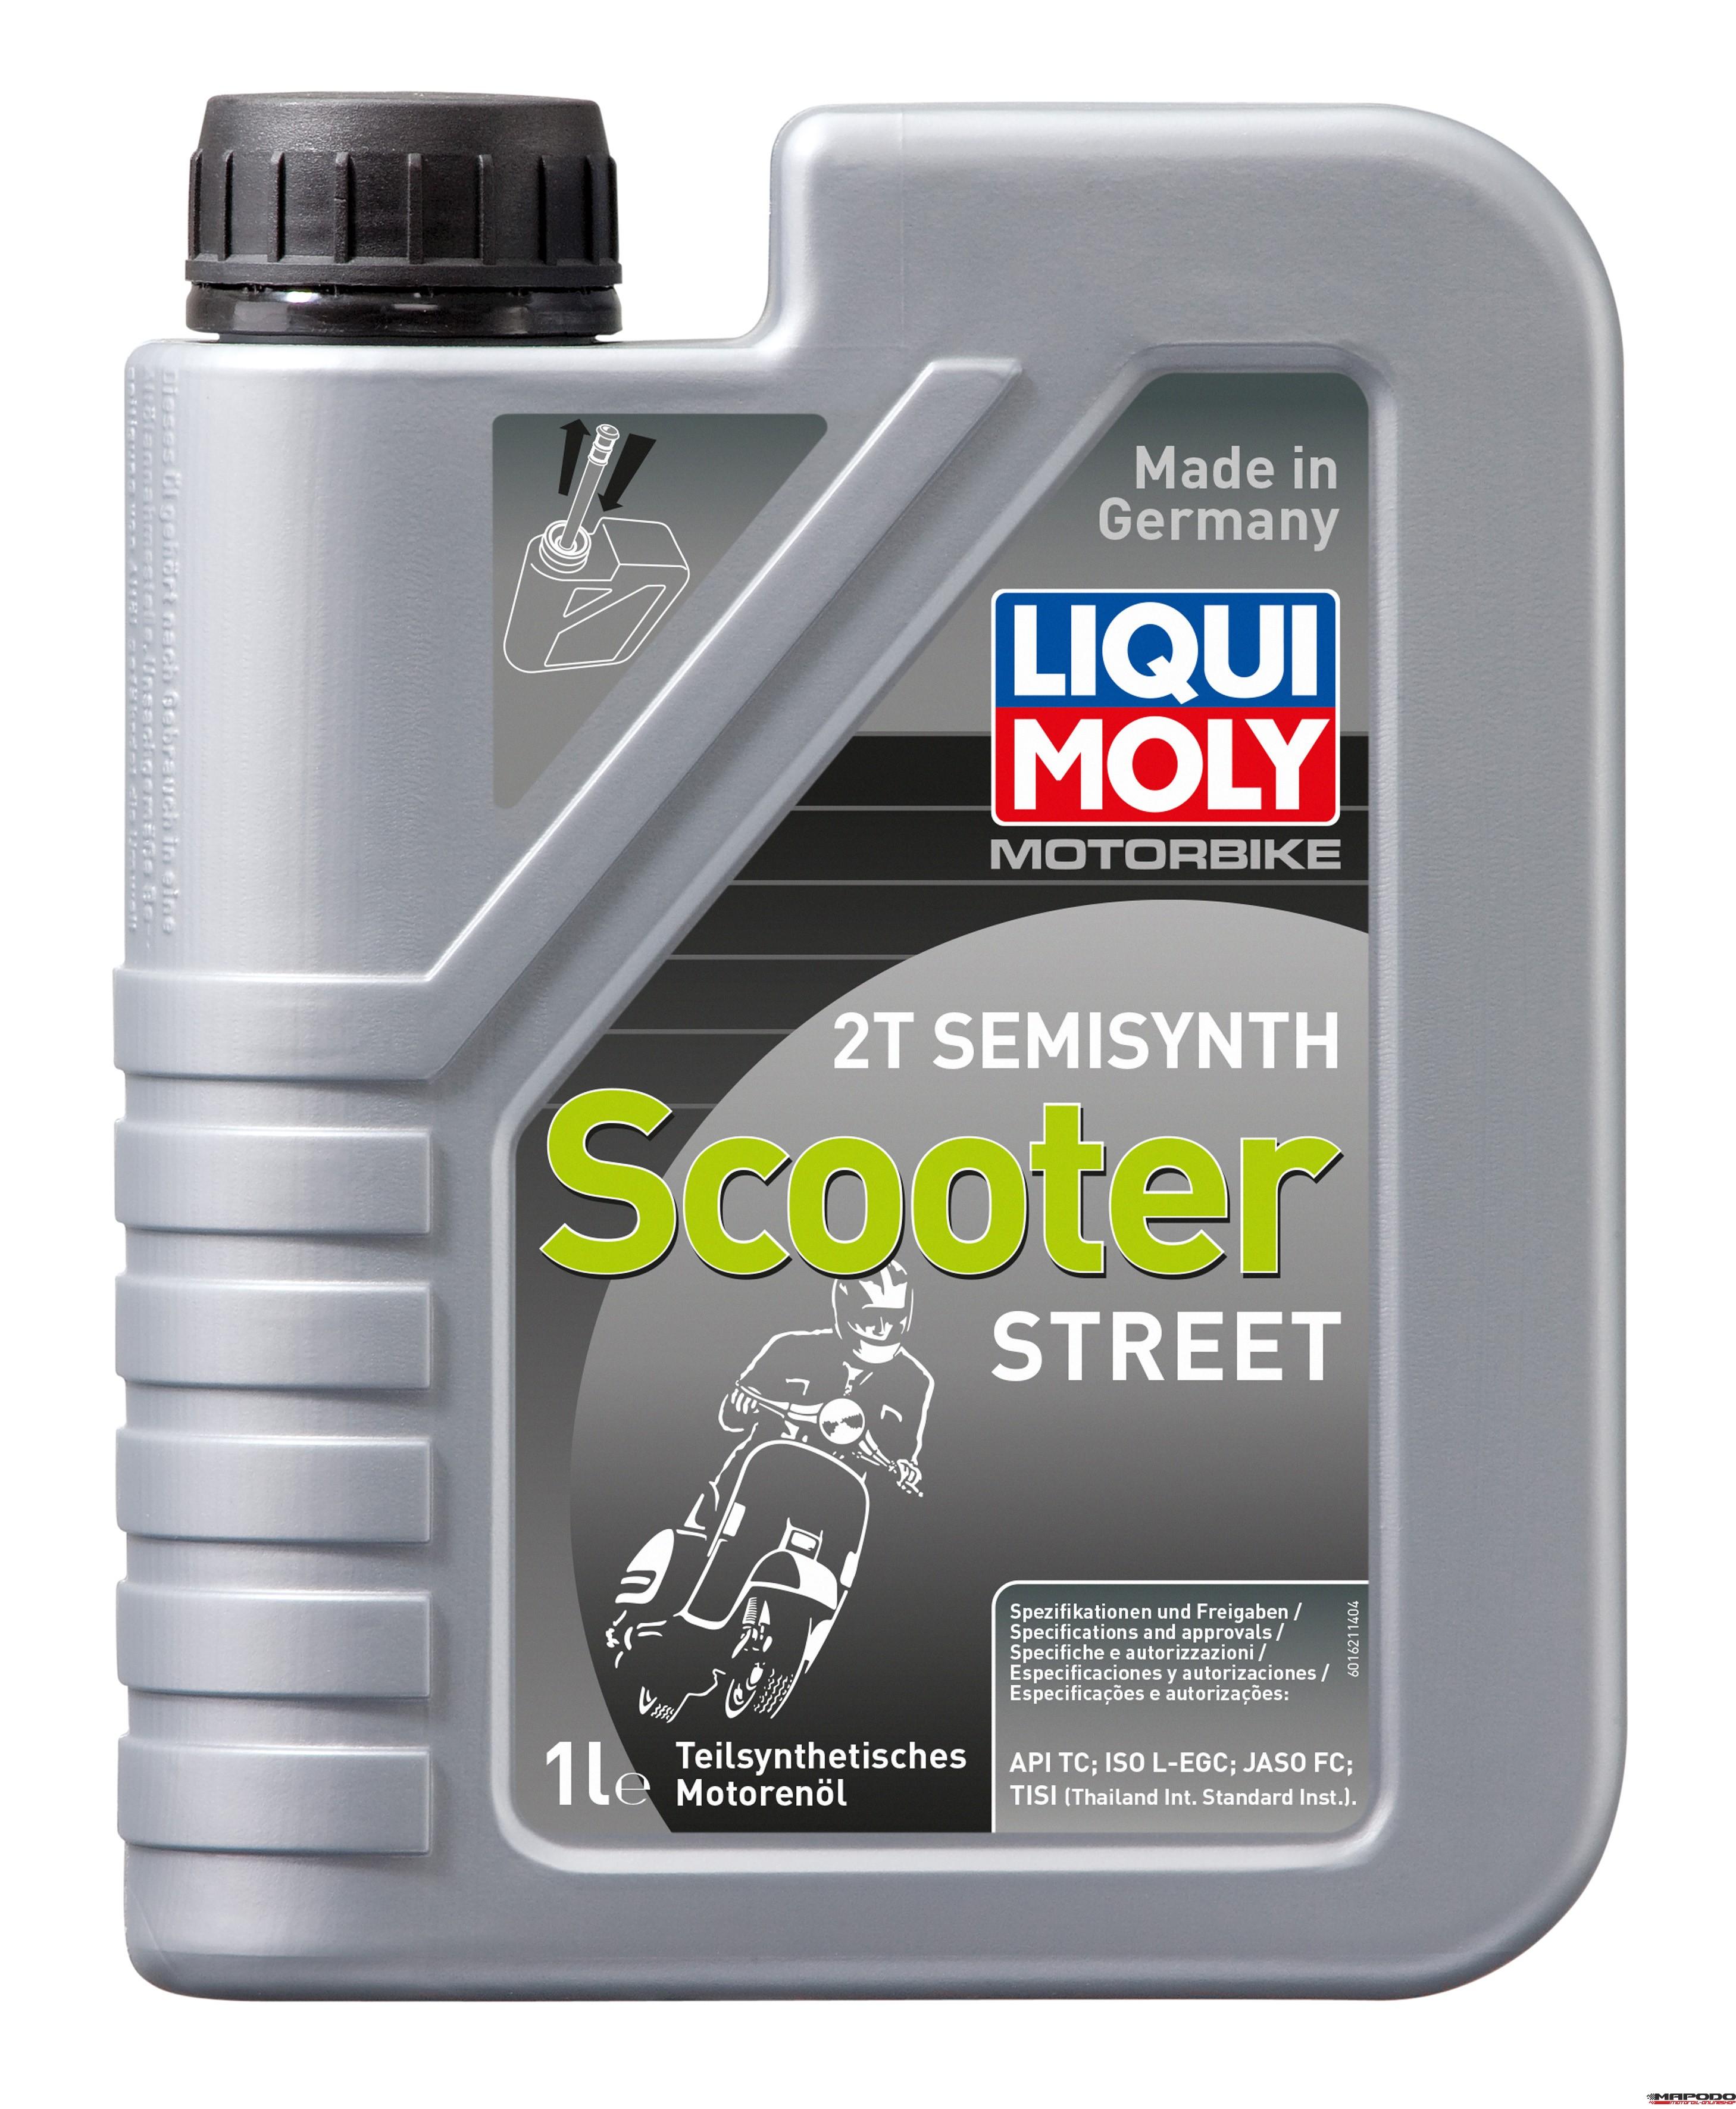 Liqui Moly 1621 Motorbike 2T Semisynth Scooter Street 1L